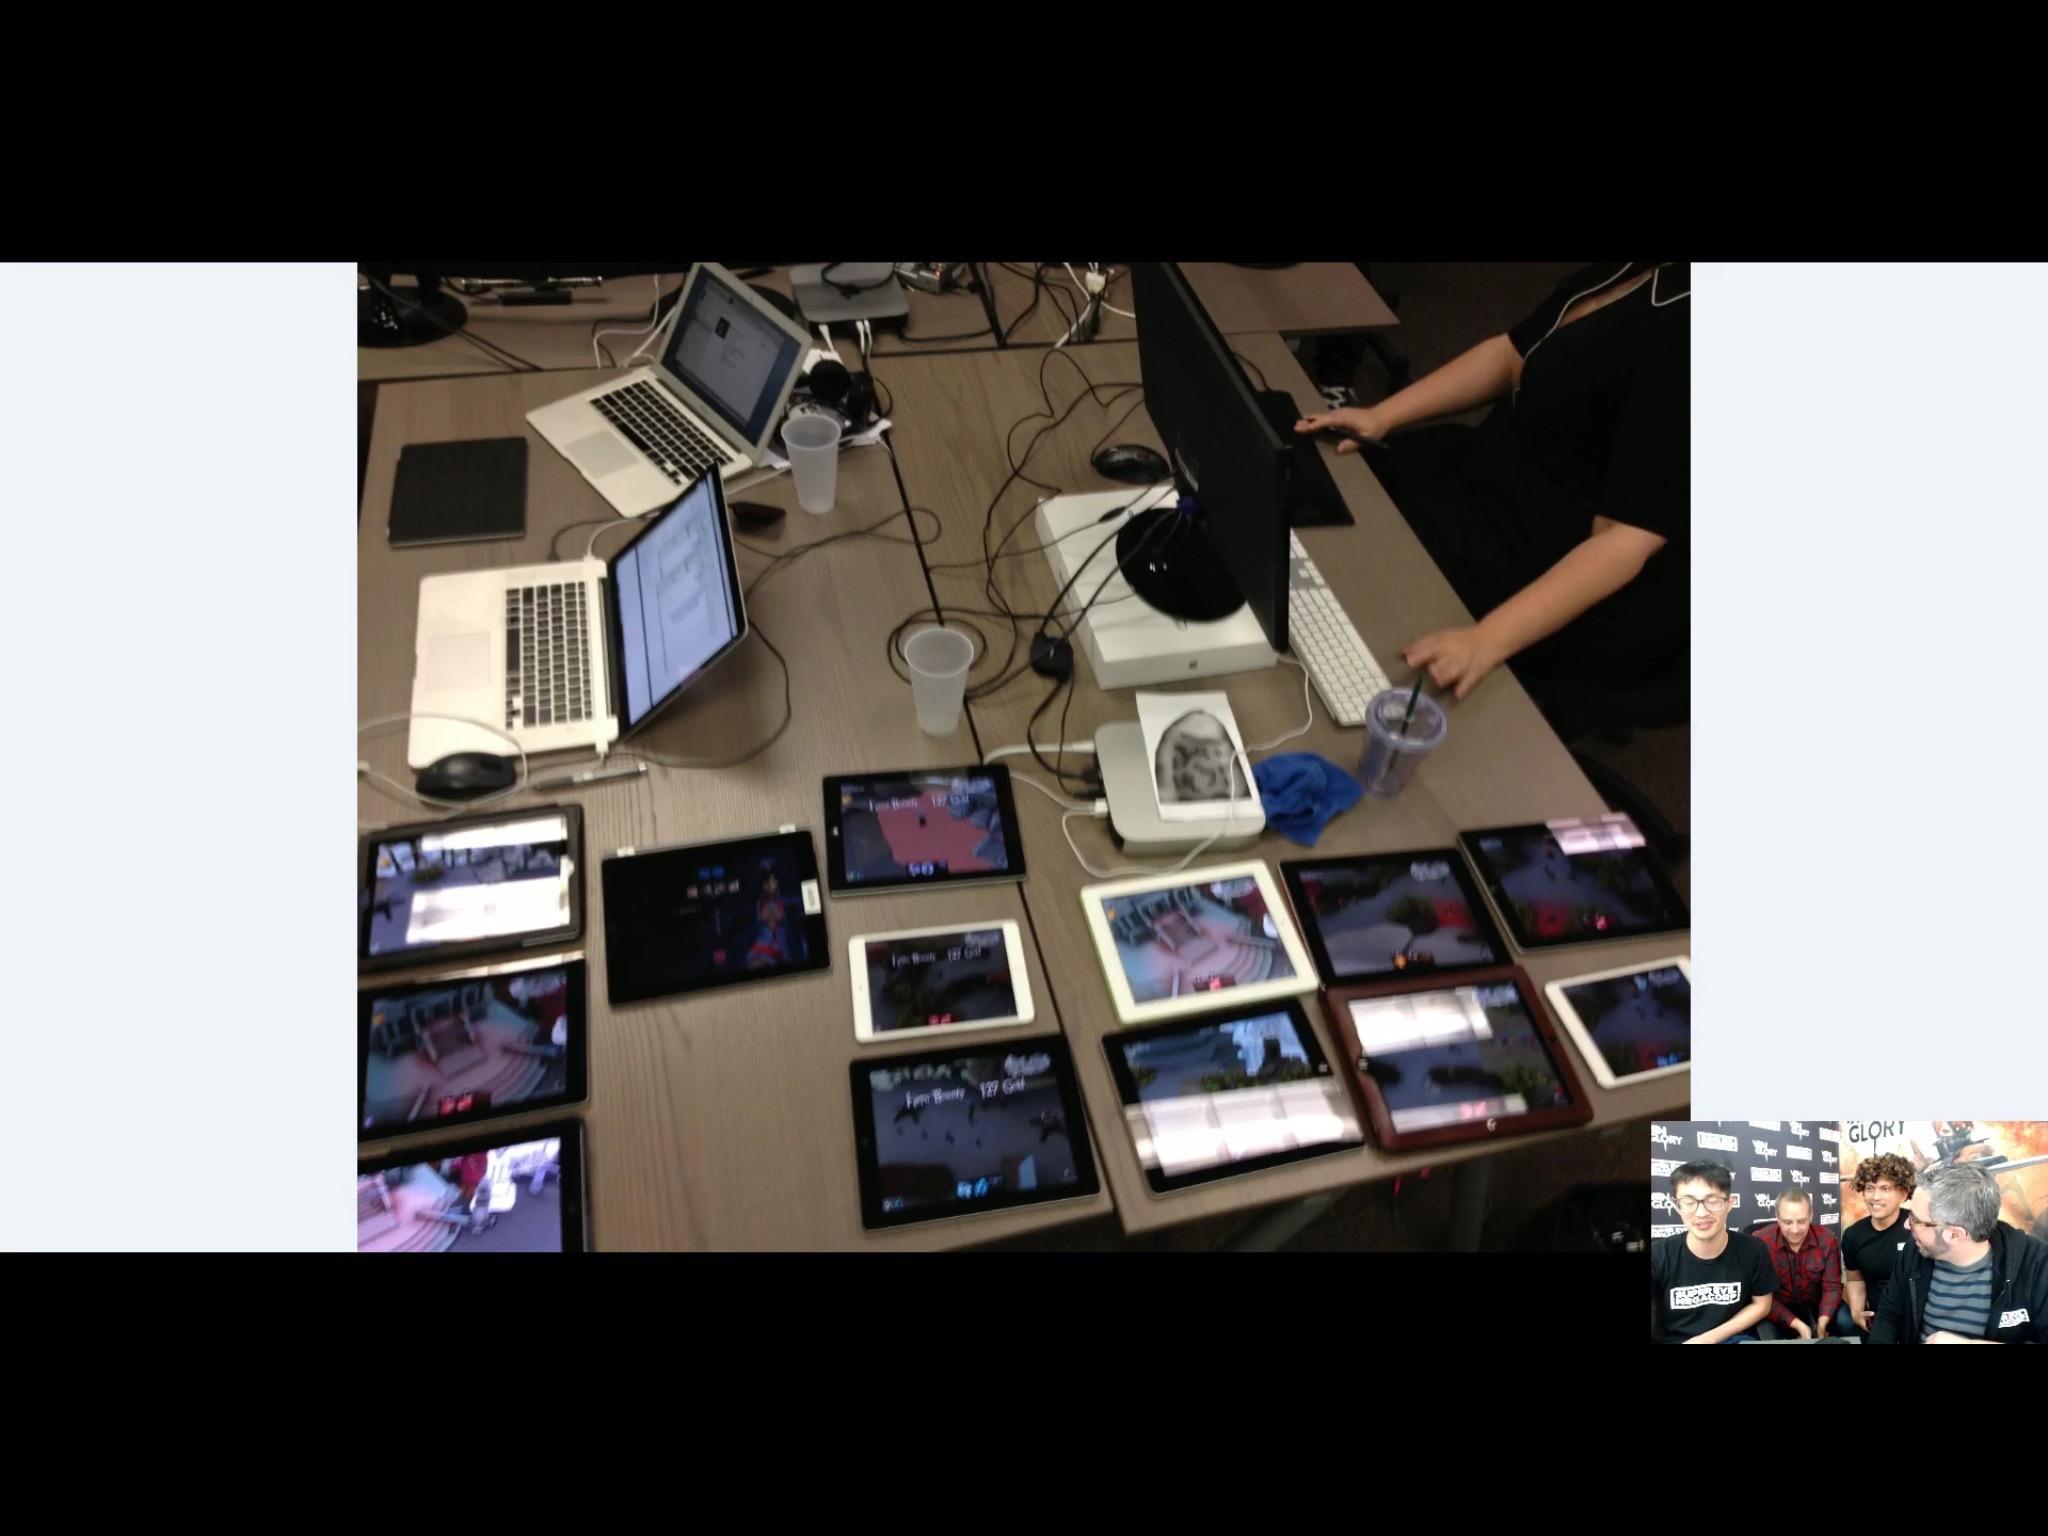 Ton of iPads Used in Testing